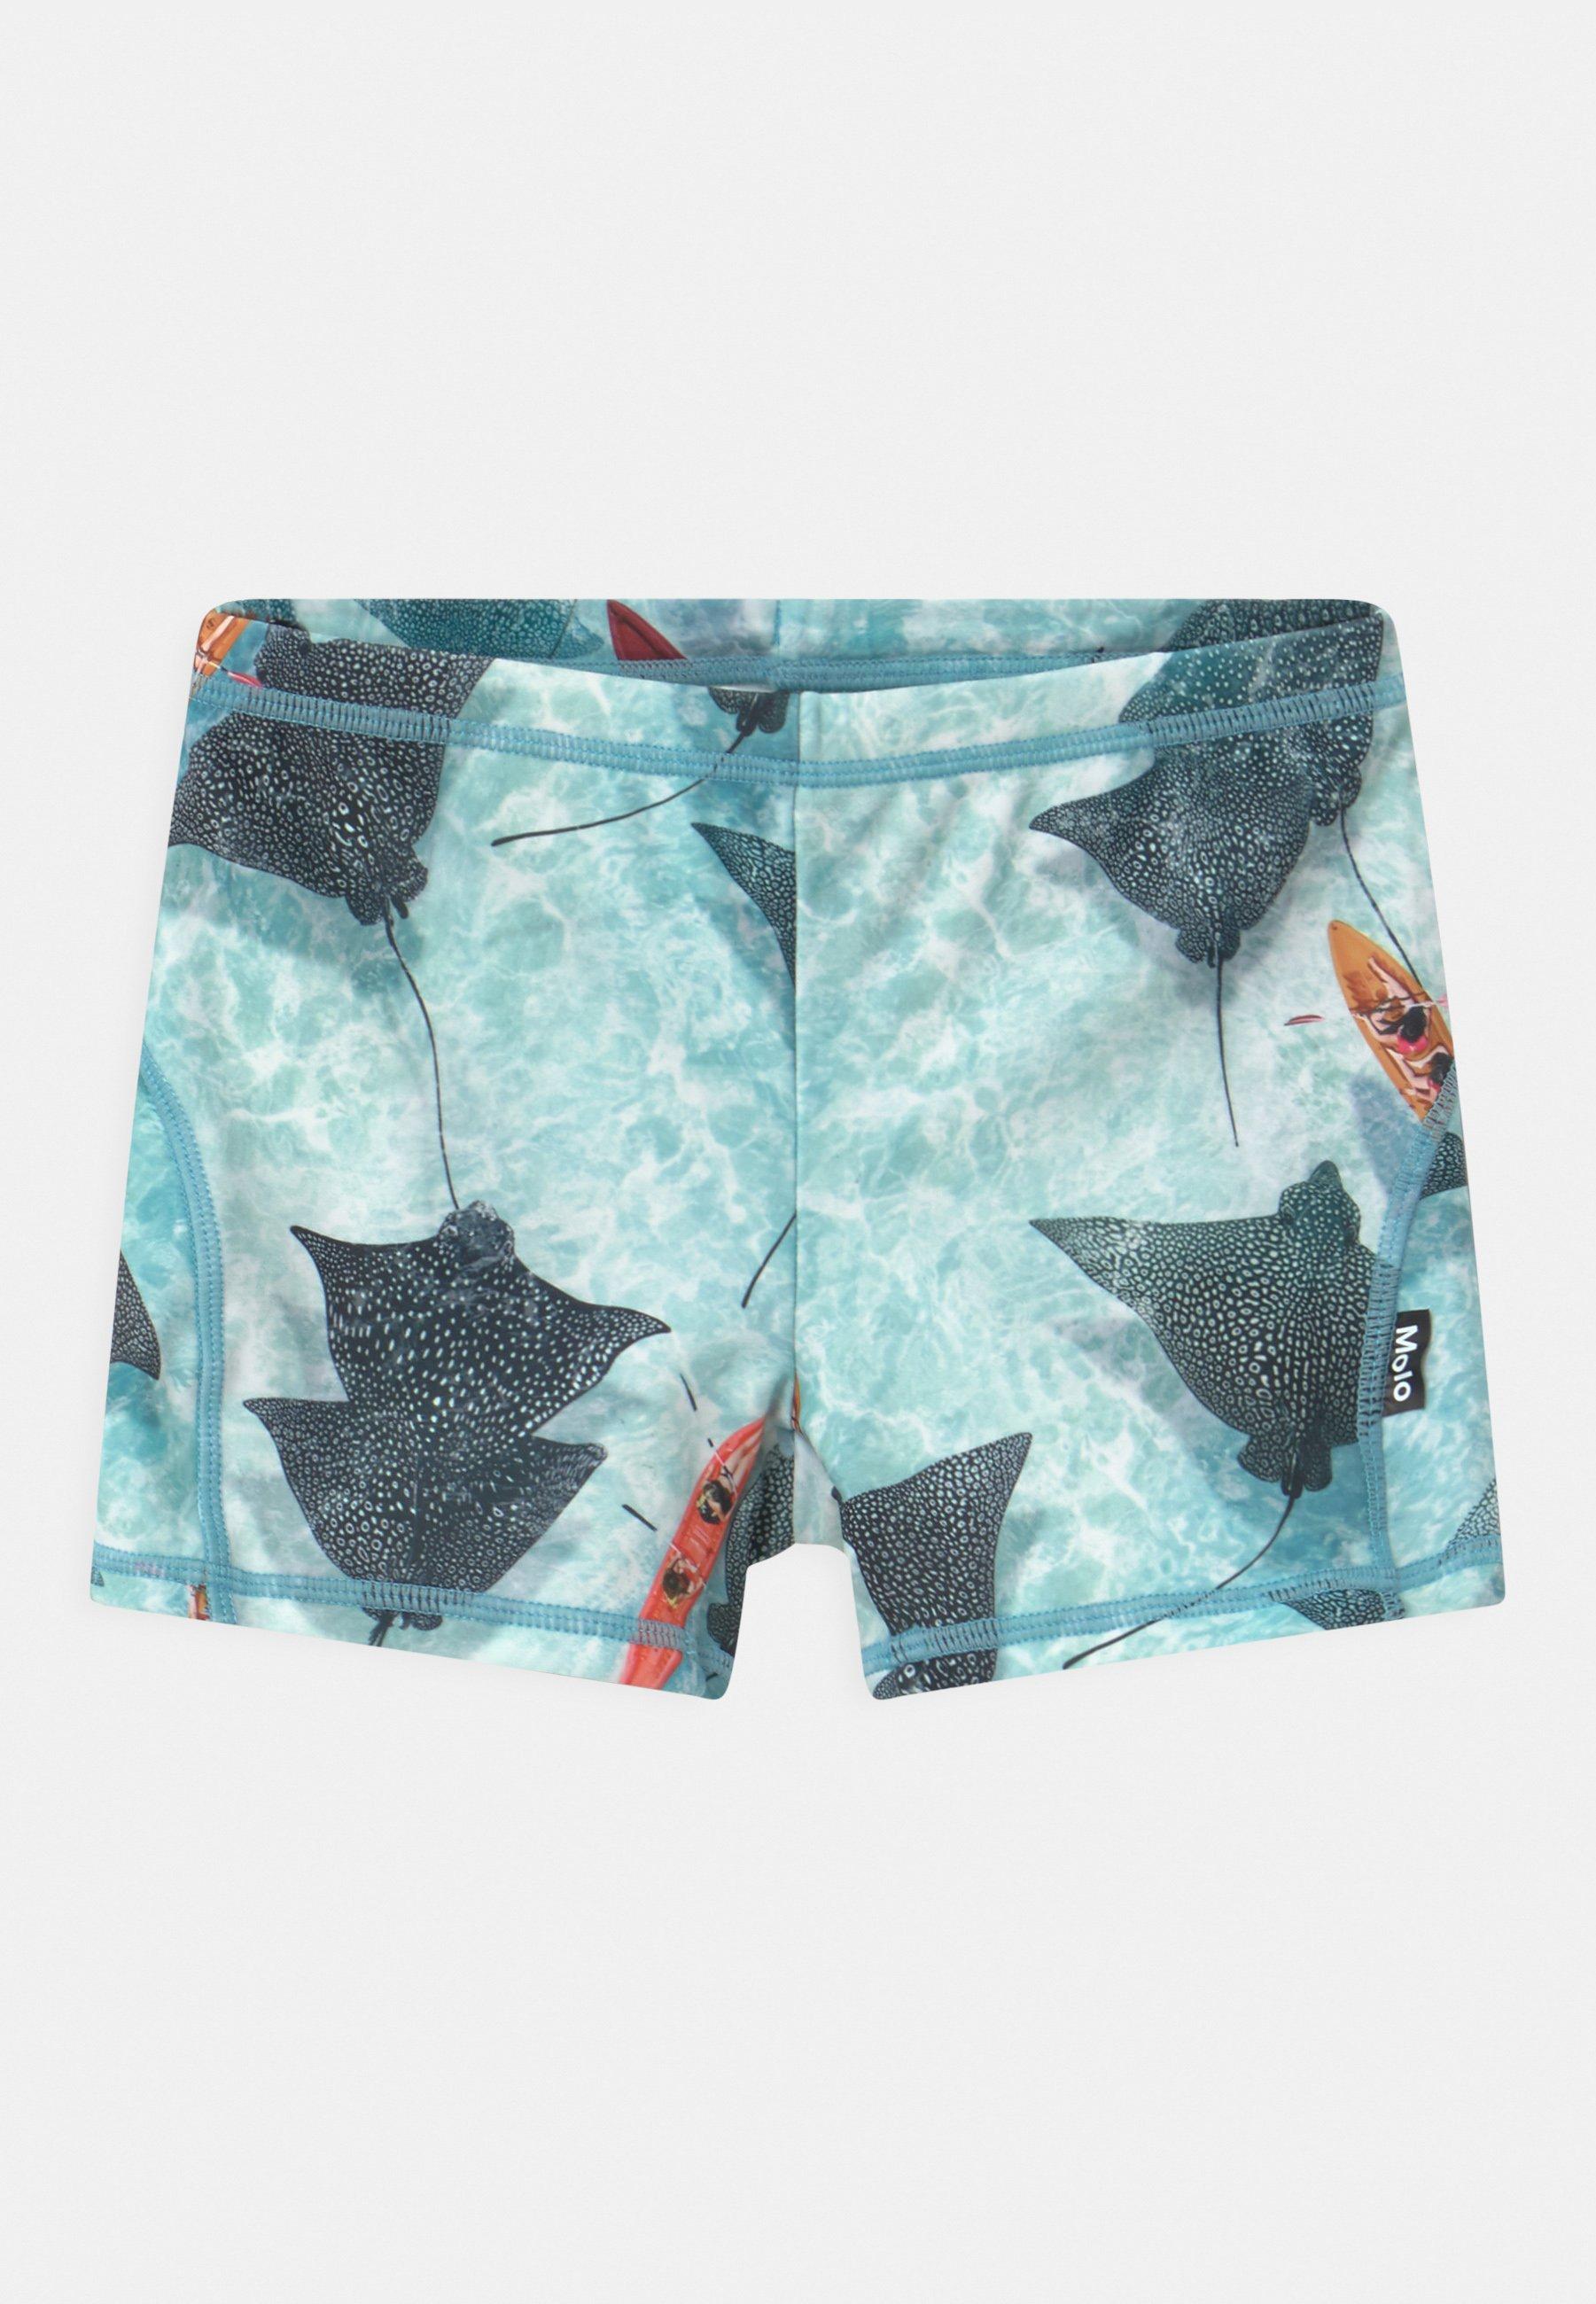 Kinder NORTON - Badehose Pants